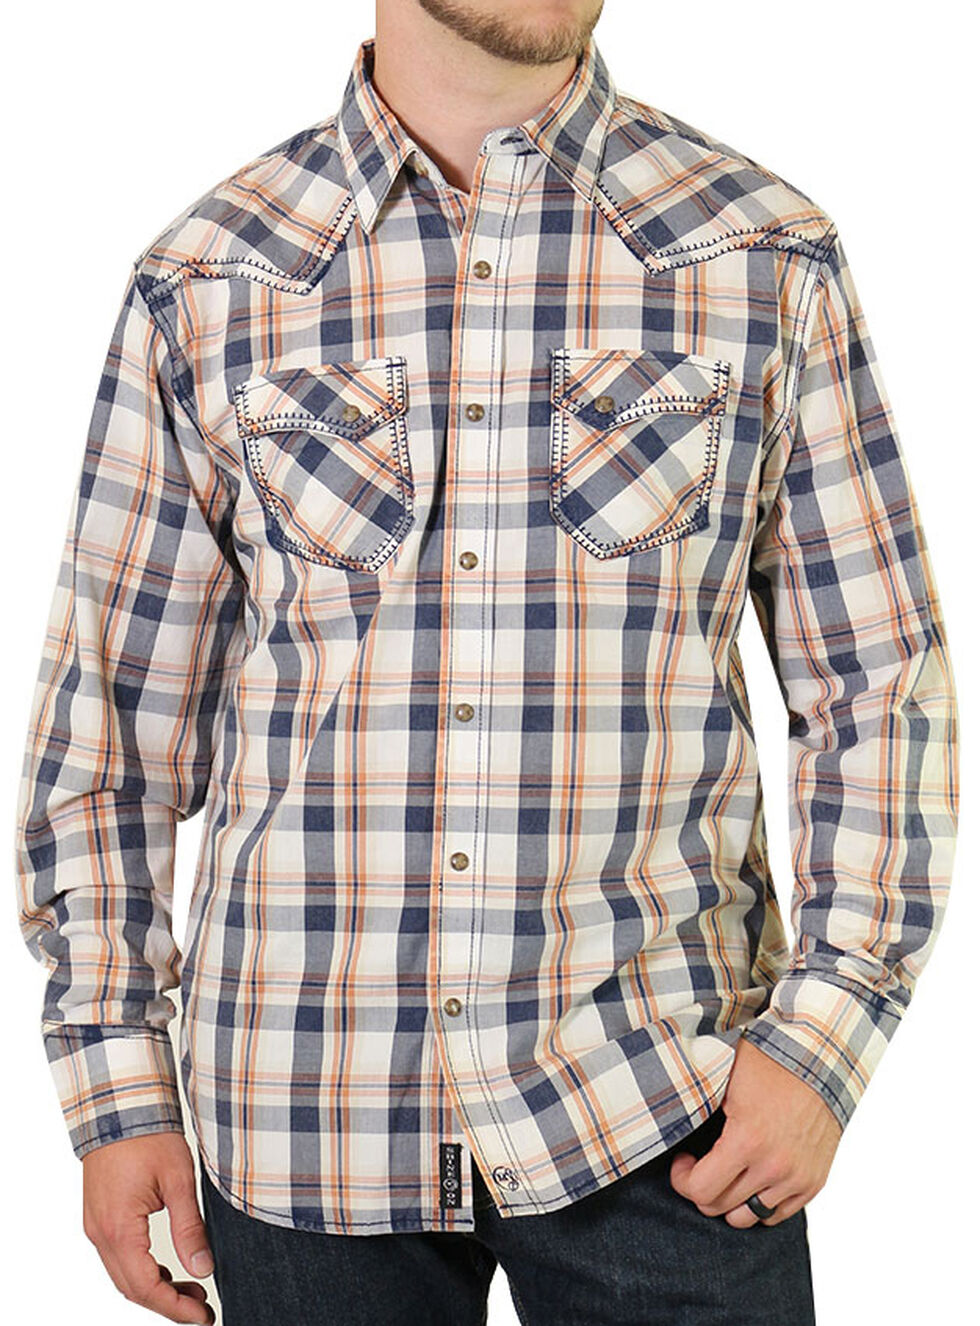 Moonshine Spirit Men's Copper Canyon Western Shirt, White, hi-res